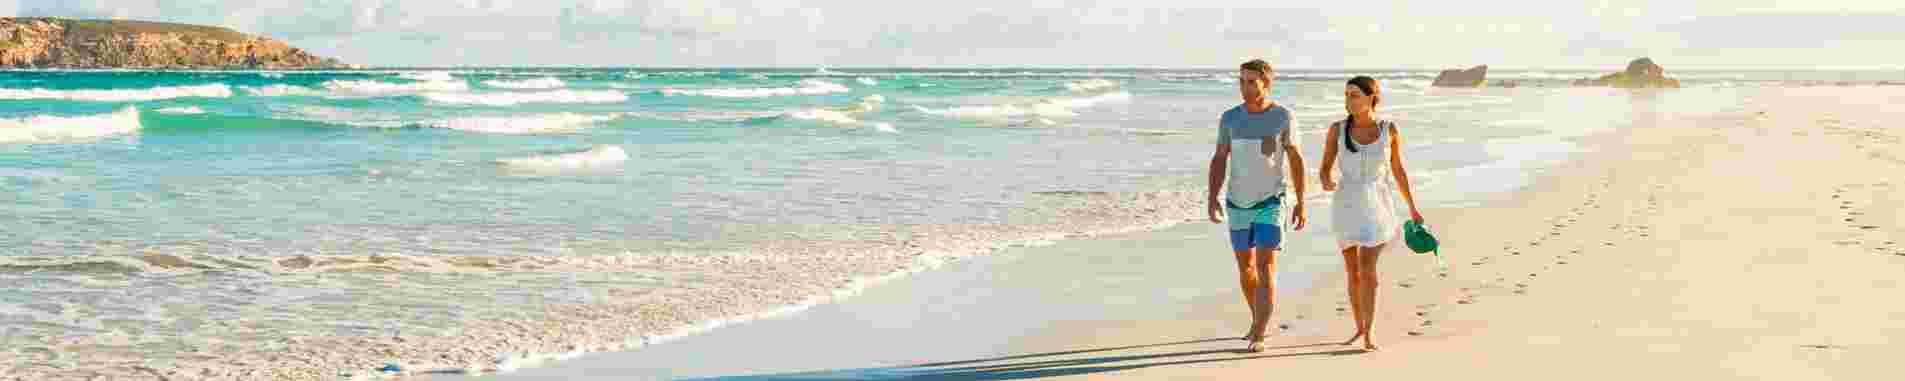 Eyre Peninsula header image